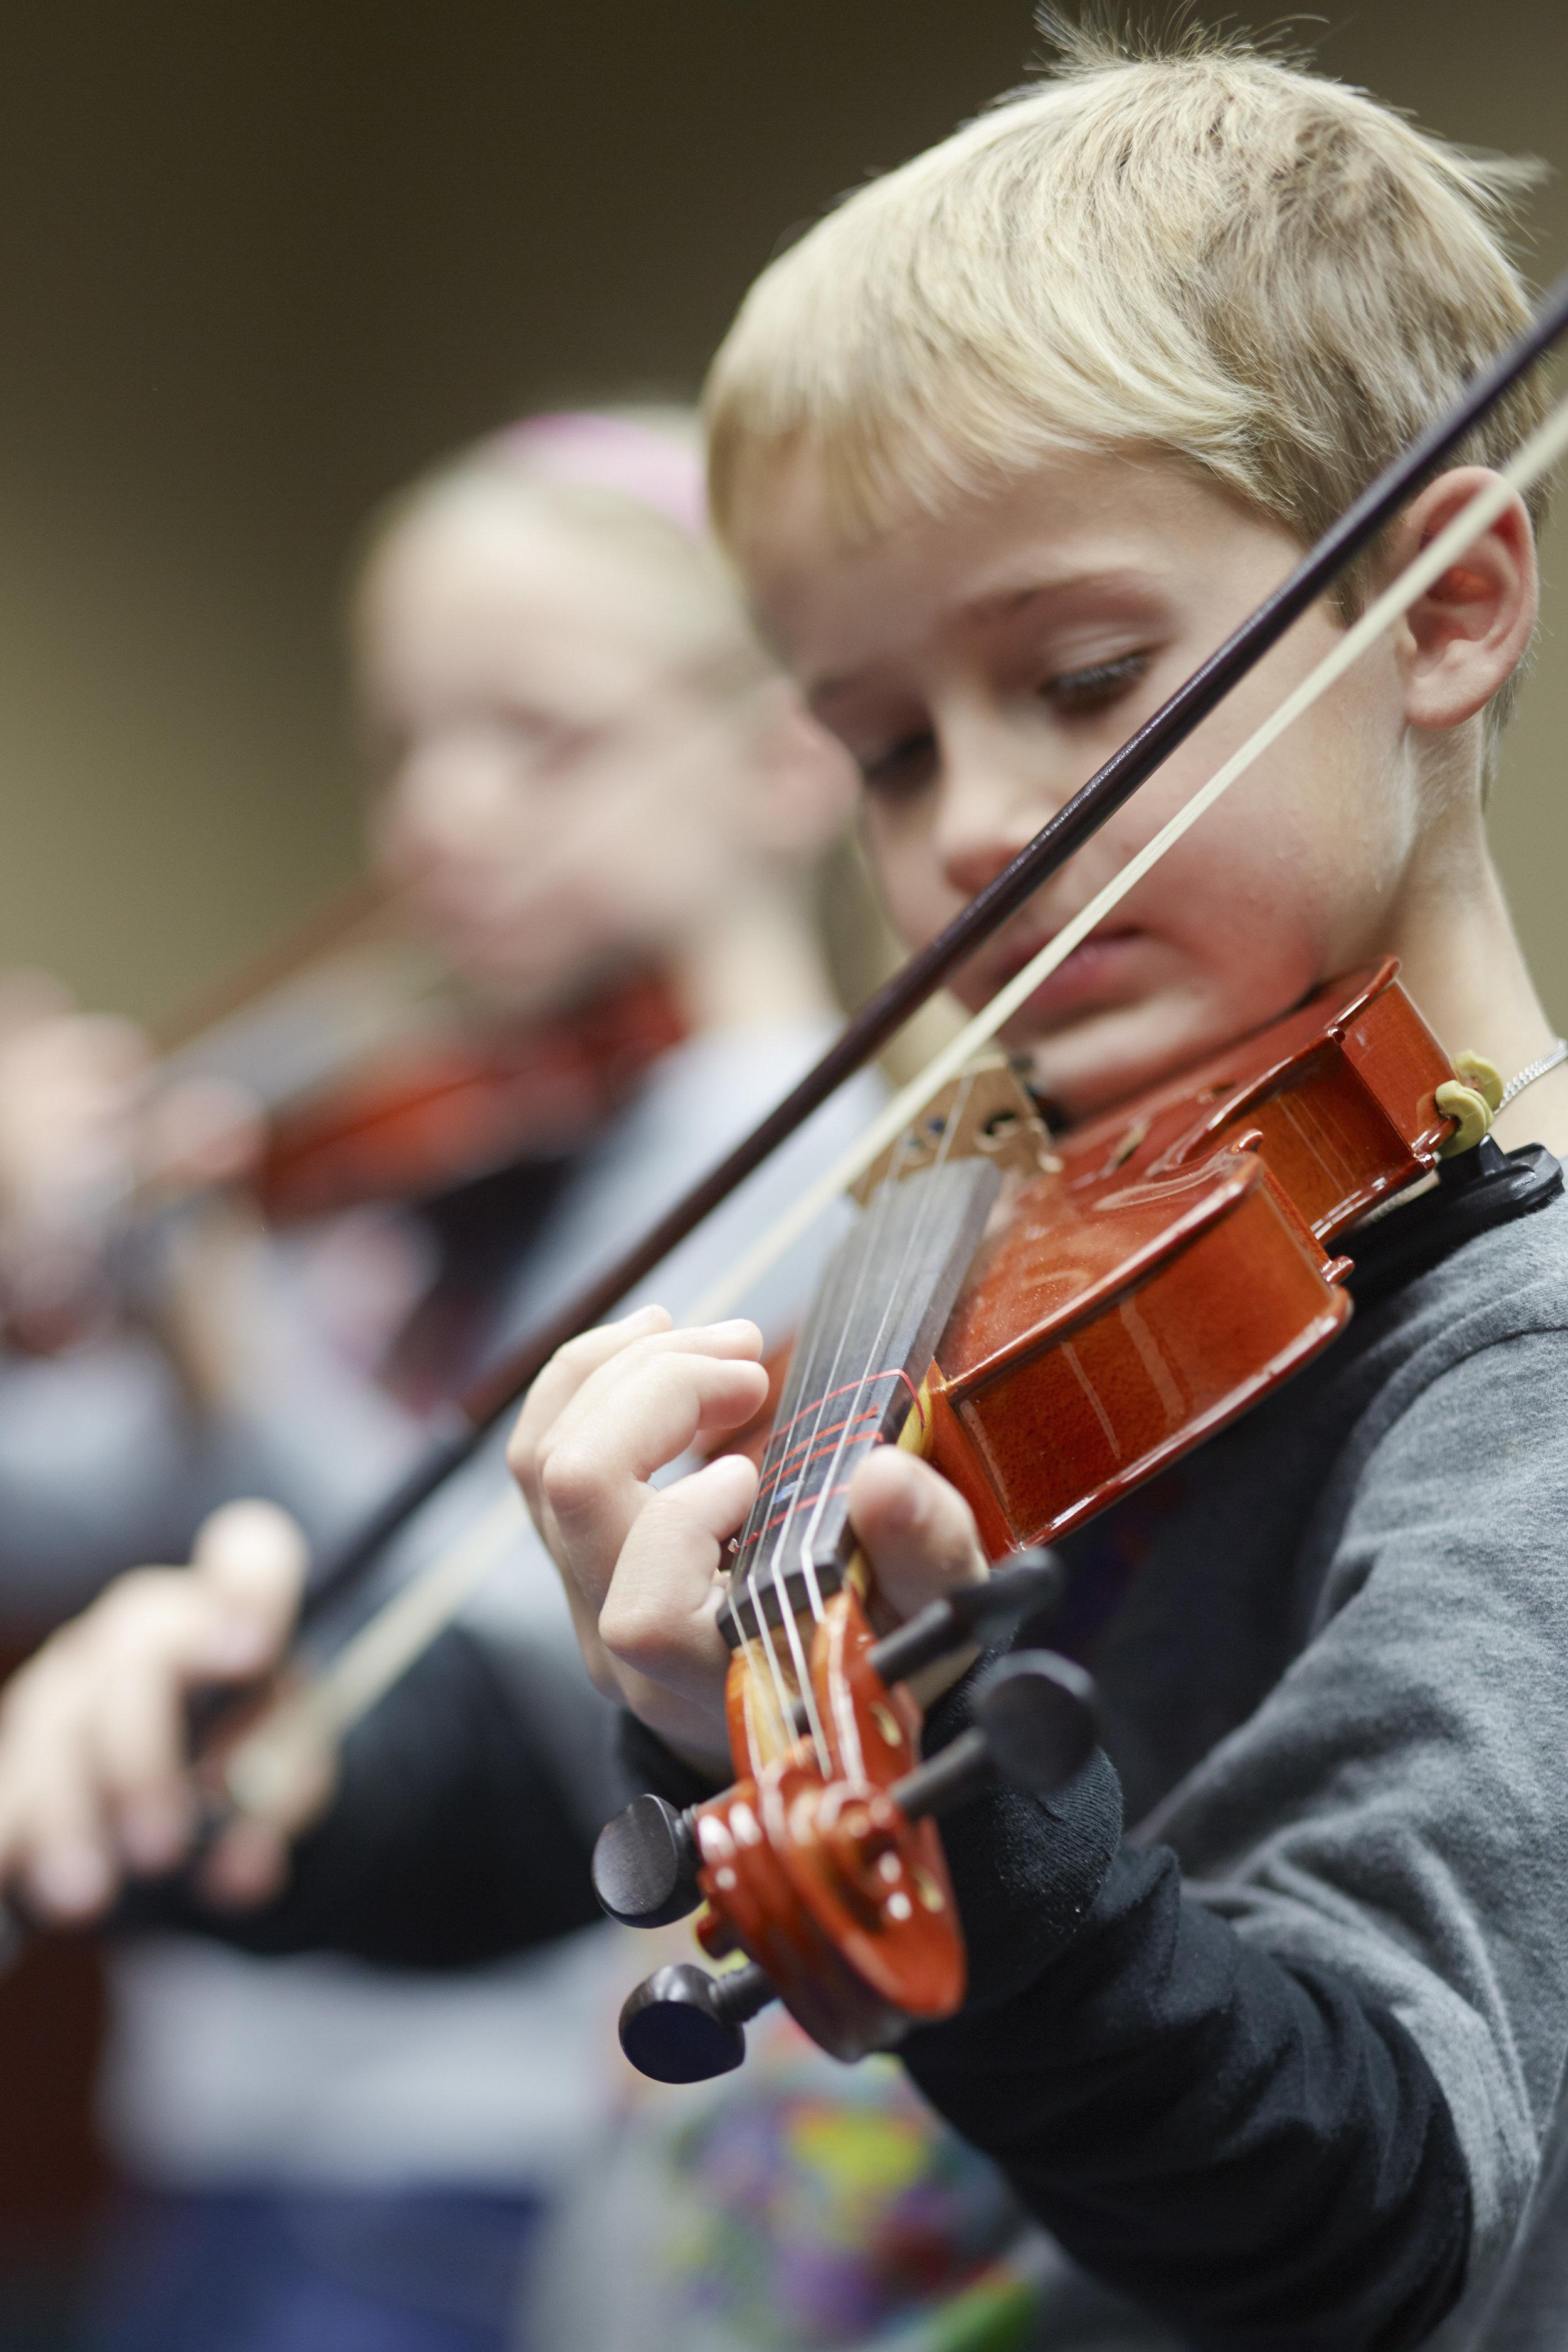 Violin_Boy2.jpg